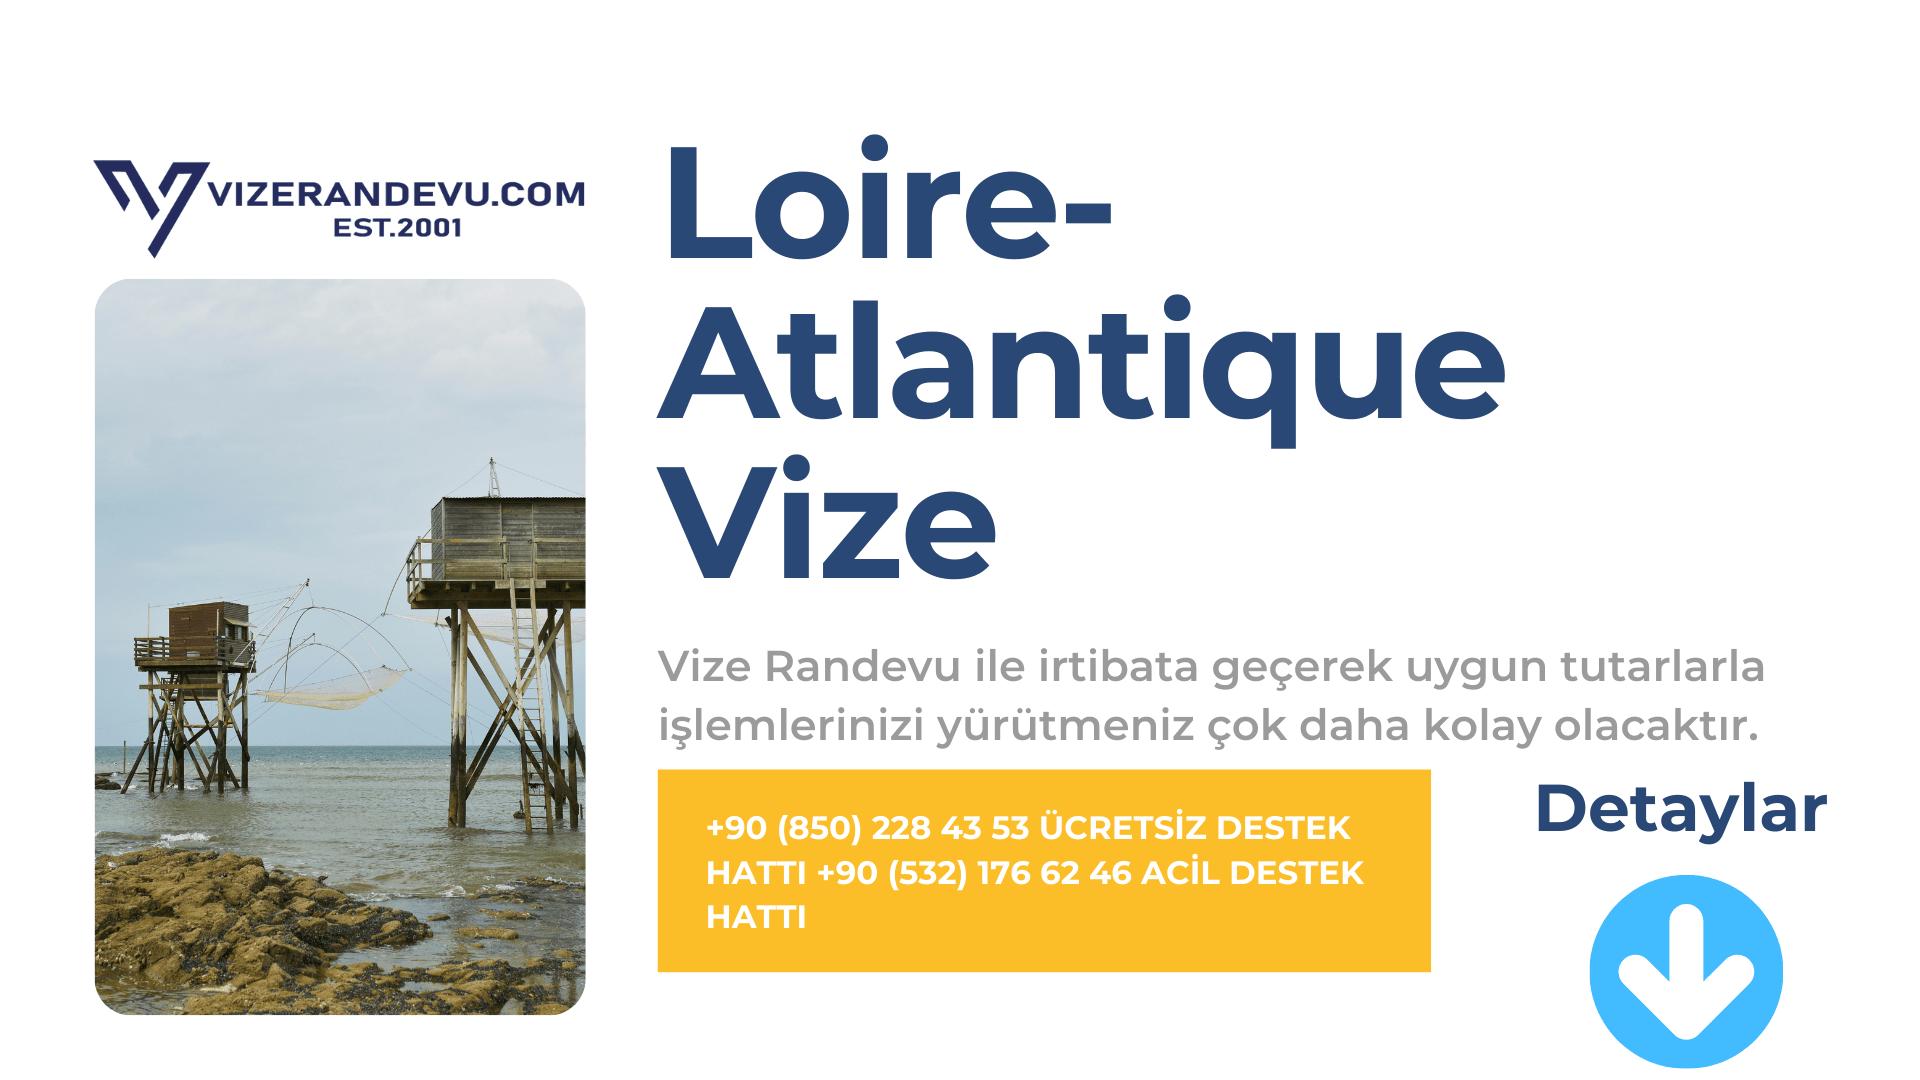 Fransa Loire-Atlantique Vize Başvurusu